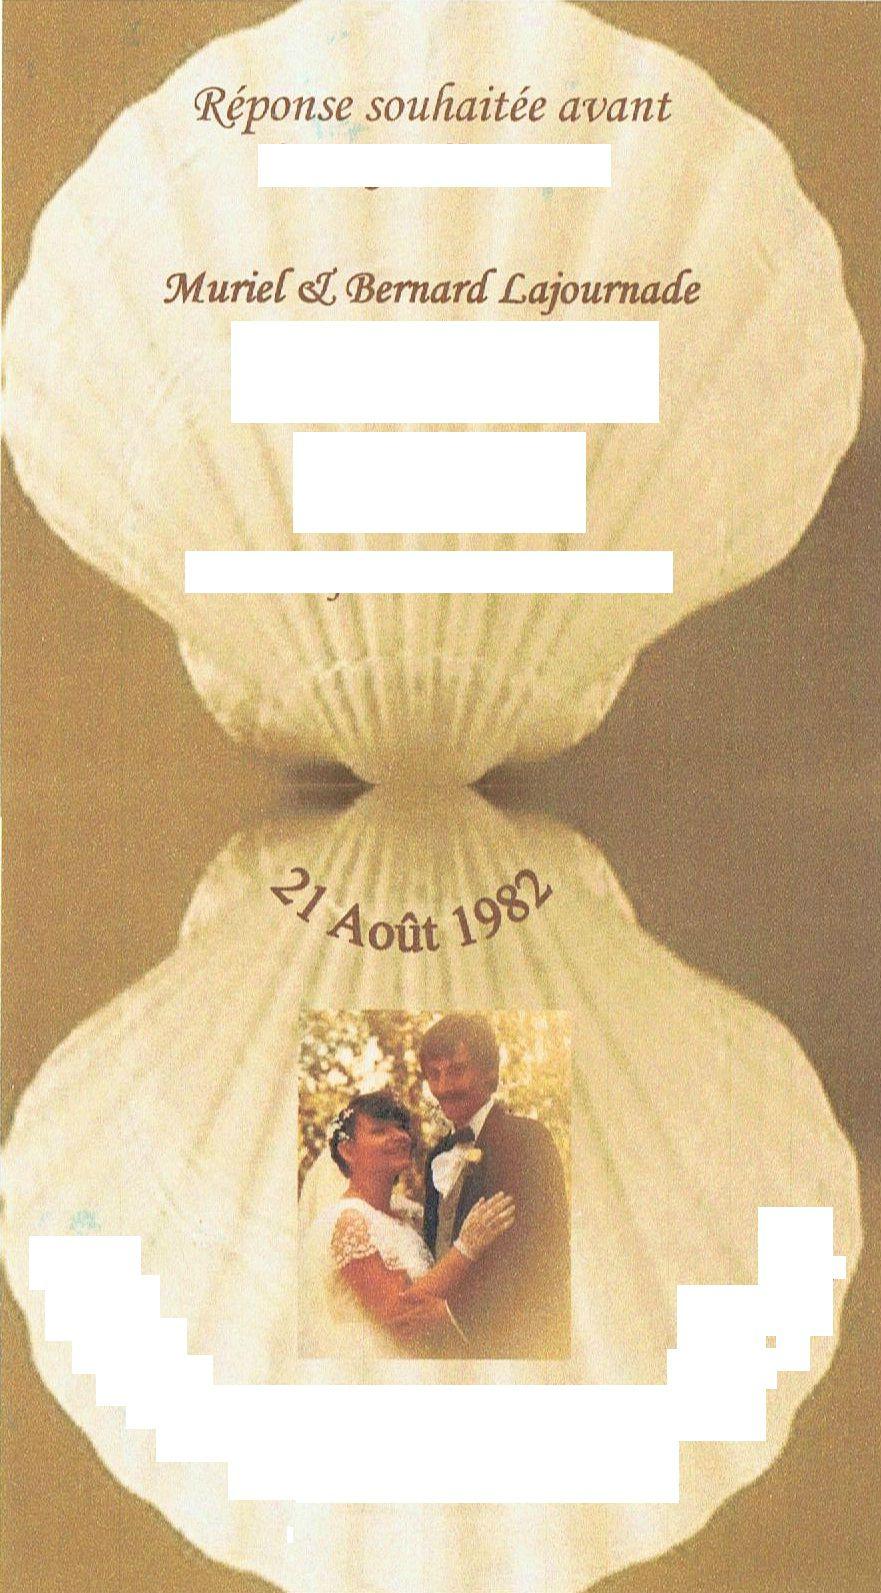 Diamond wedding bands cadeau de noces de perle - 3 ans de mariage noce de quoi ...